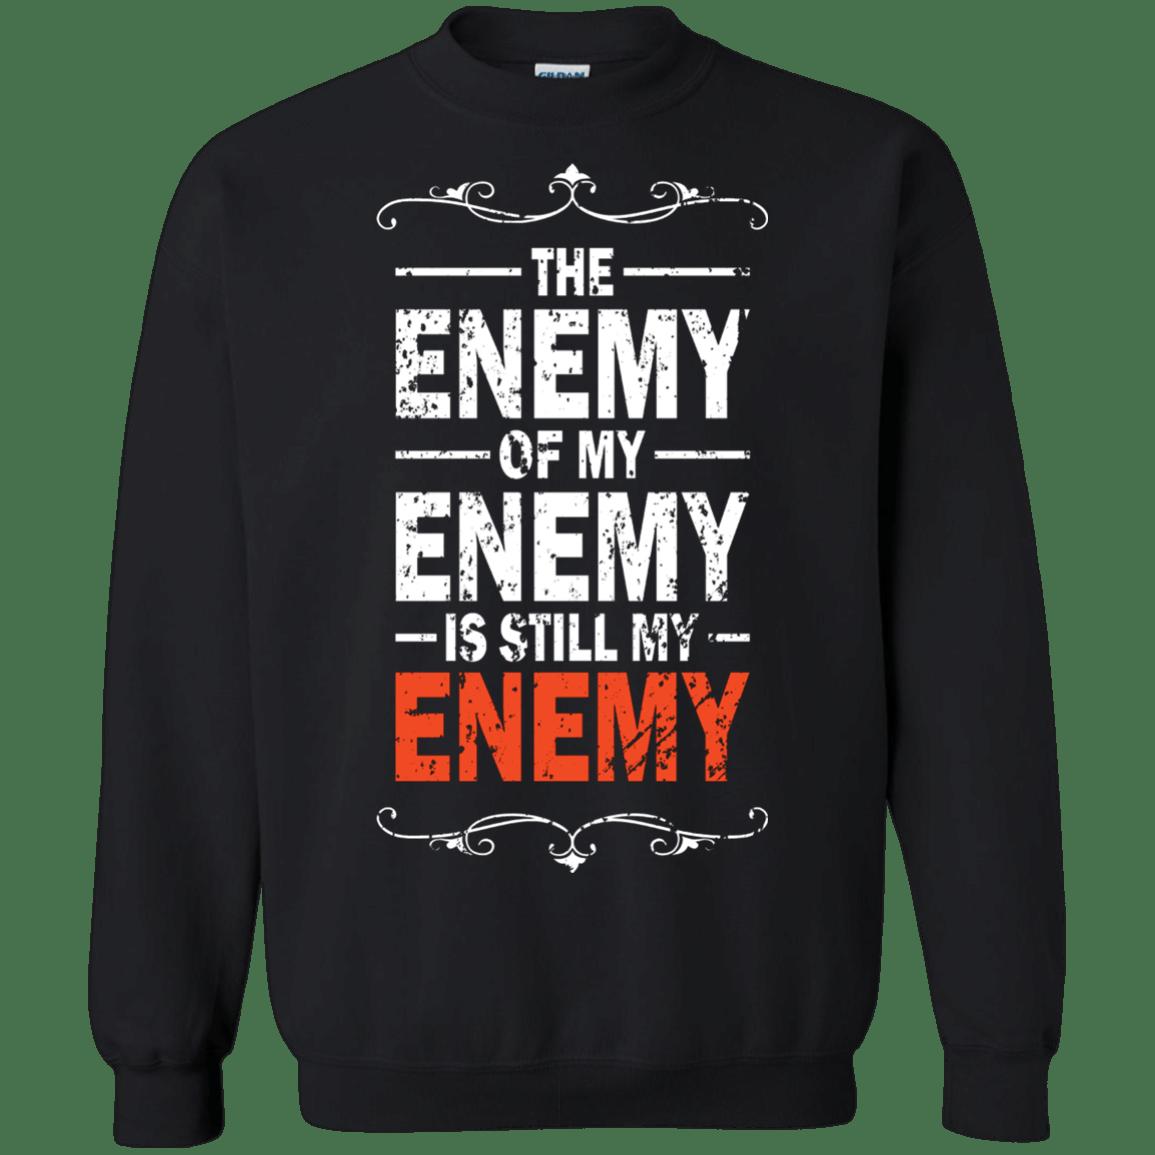 The Enemy of my Enemy is Still my Enemy G180 Gildan Crewneck Pullover